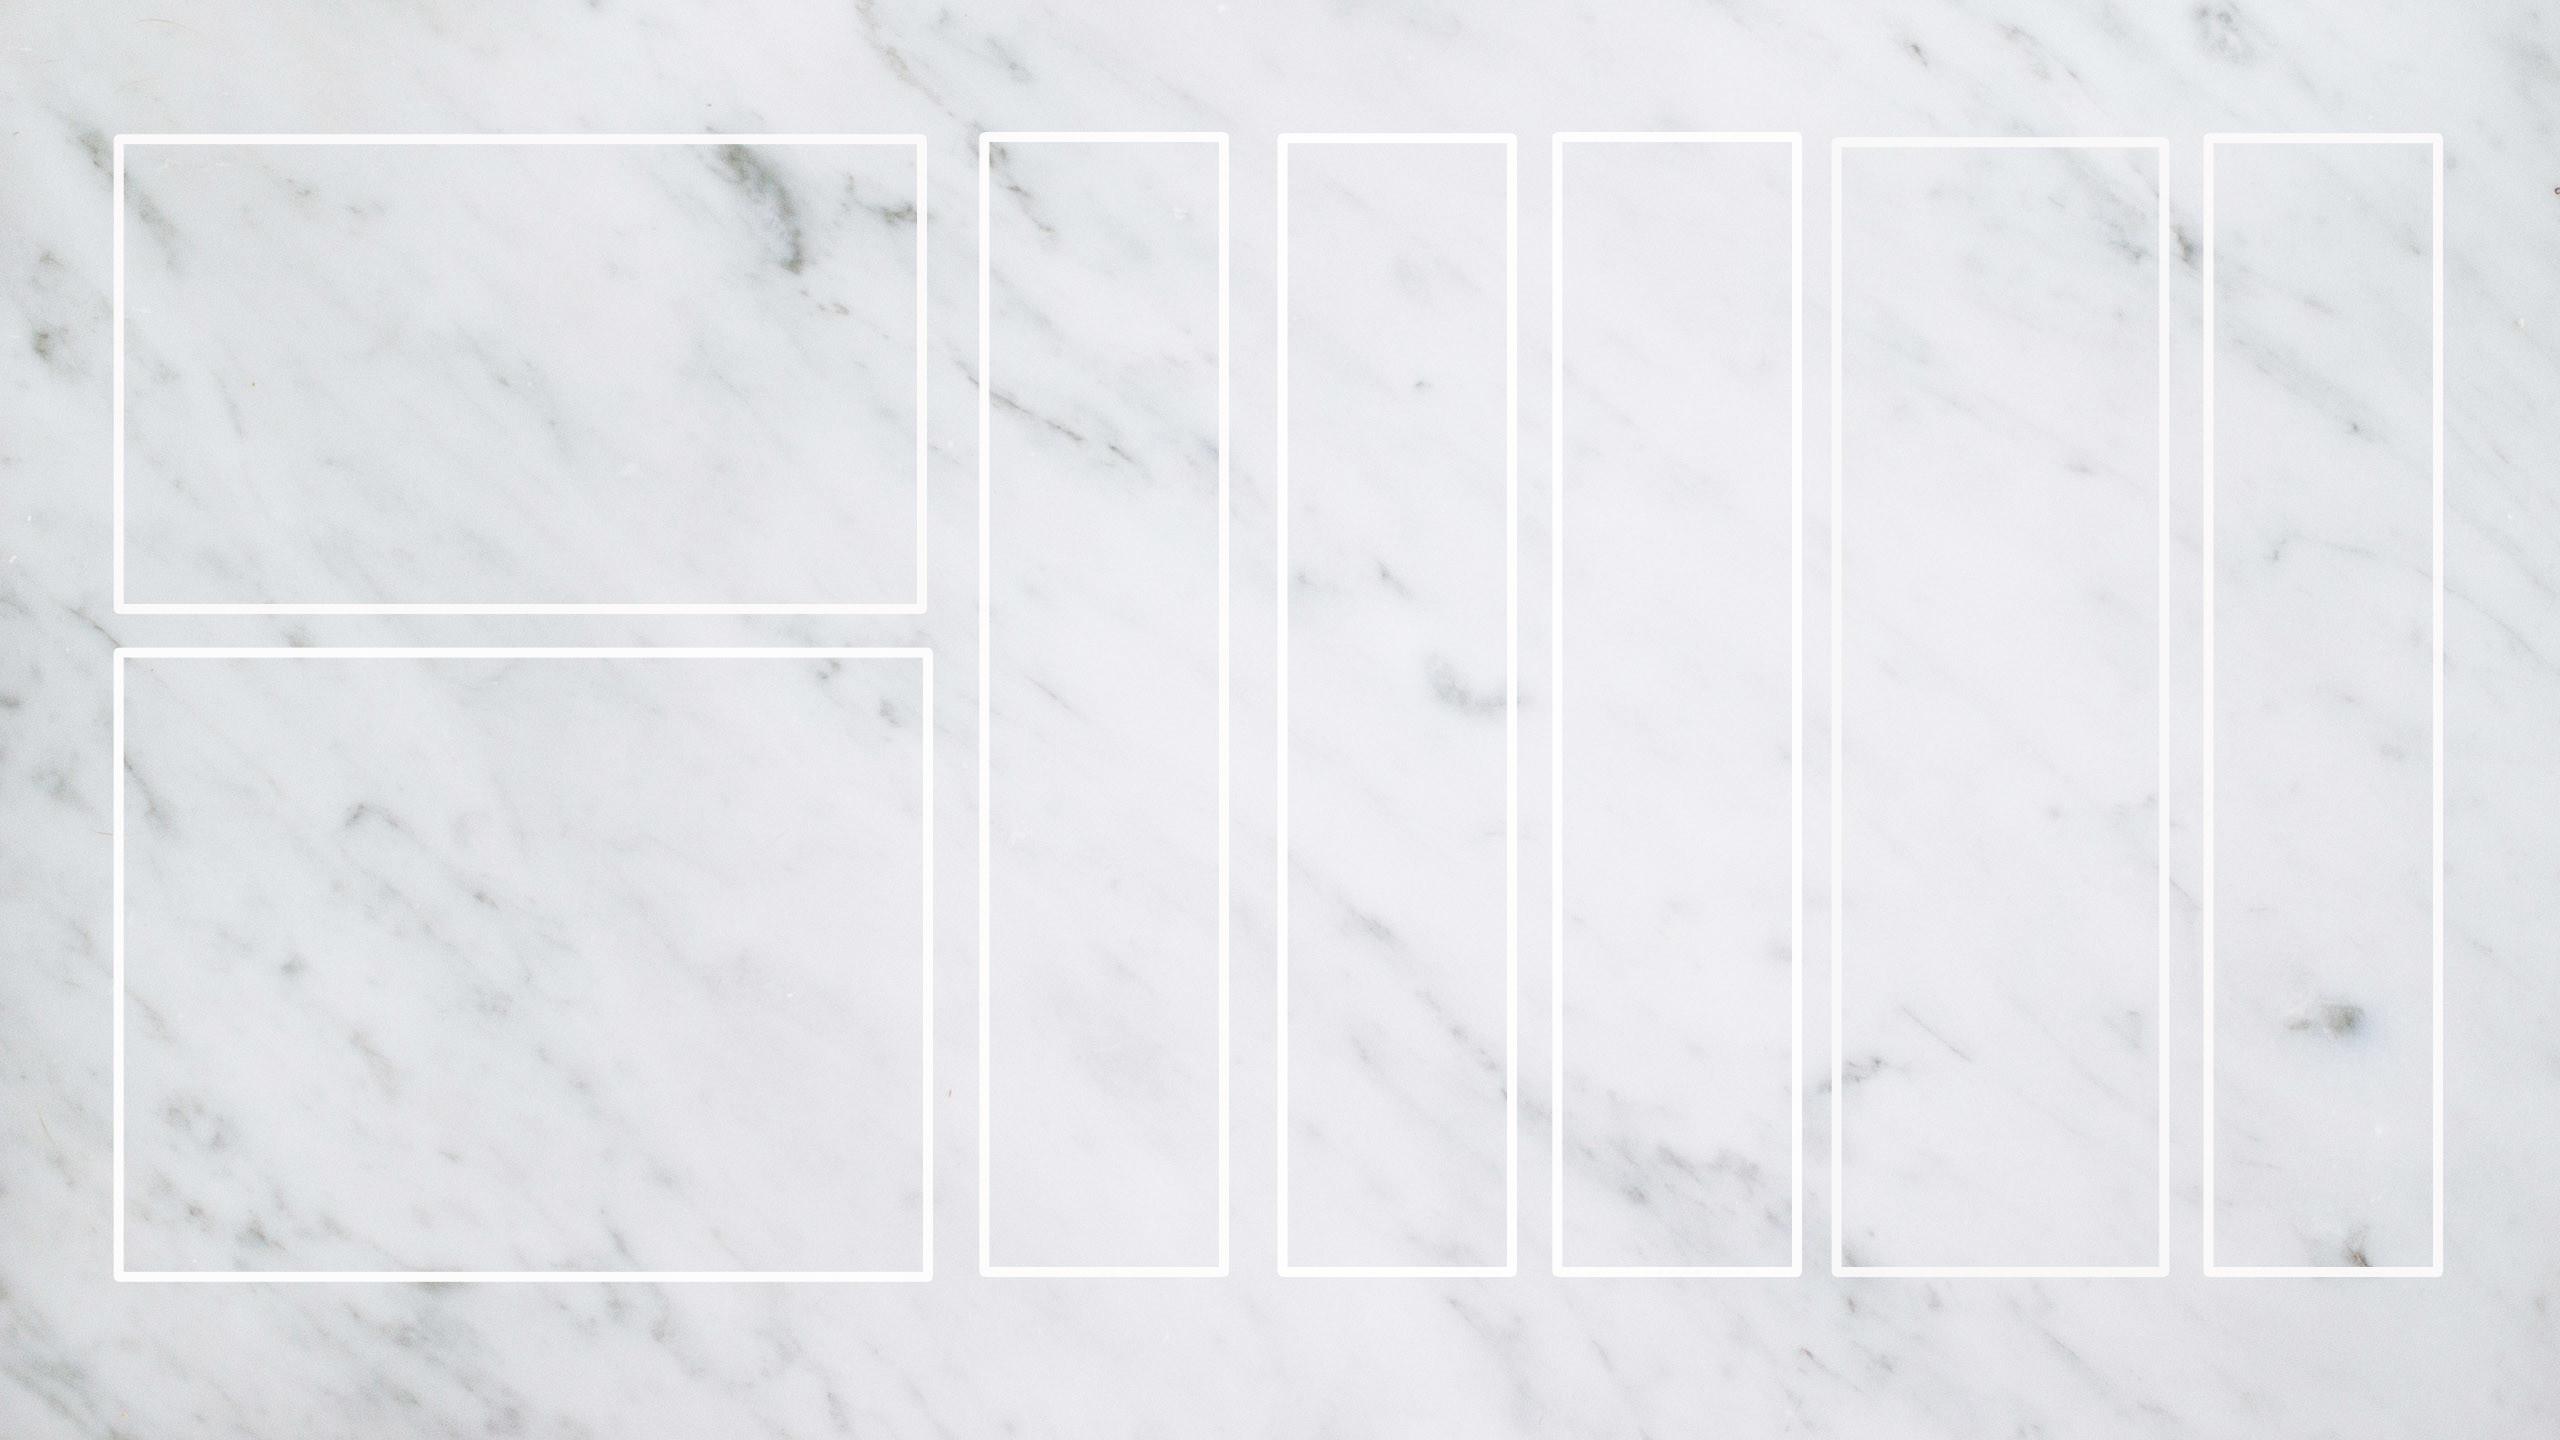 Grey white blank marble desktop organizer wallpaper | artwork |  illustrations | photography | Pinterest | Desktop organizer wallpaper,  Wallpaper and …